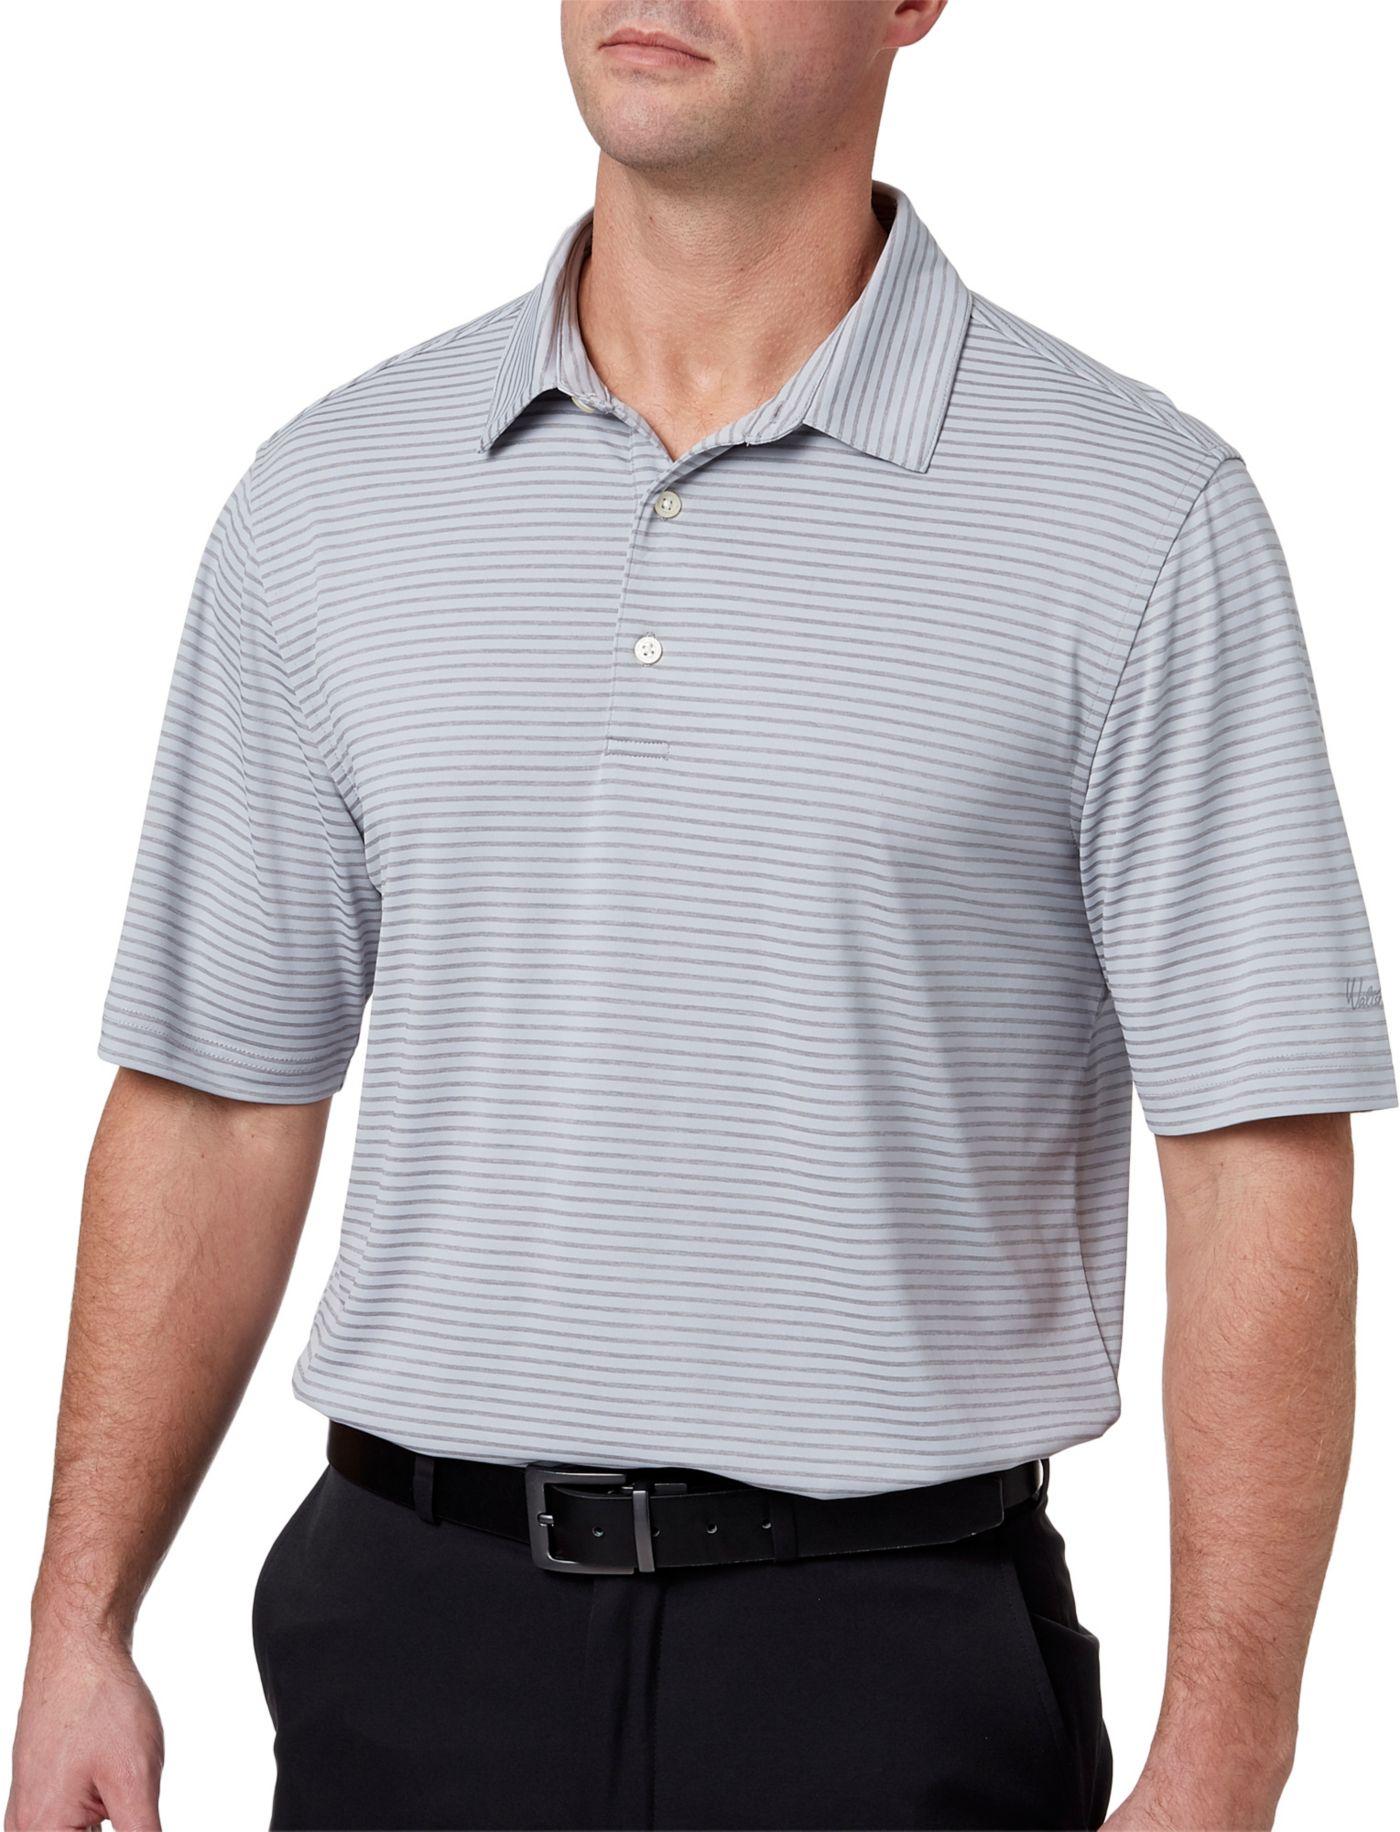 Walter Hagen Men's Essential Texture Stripe Golf Polo